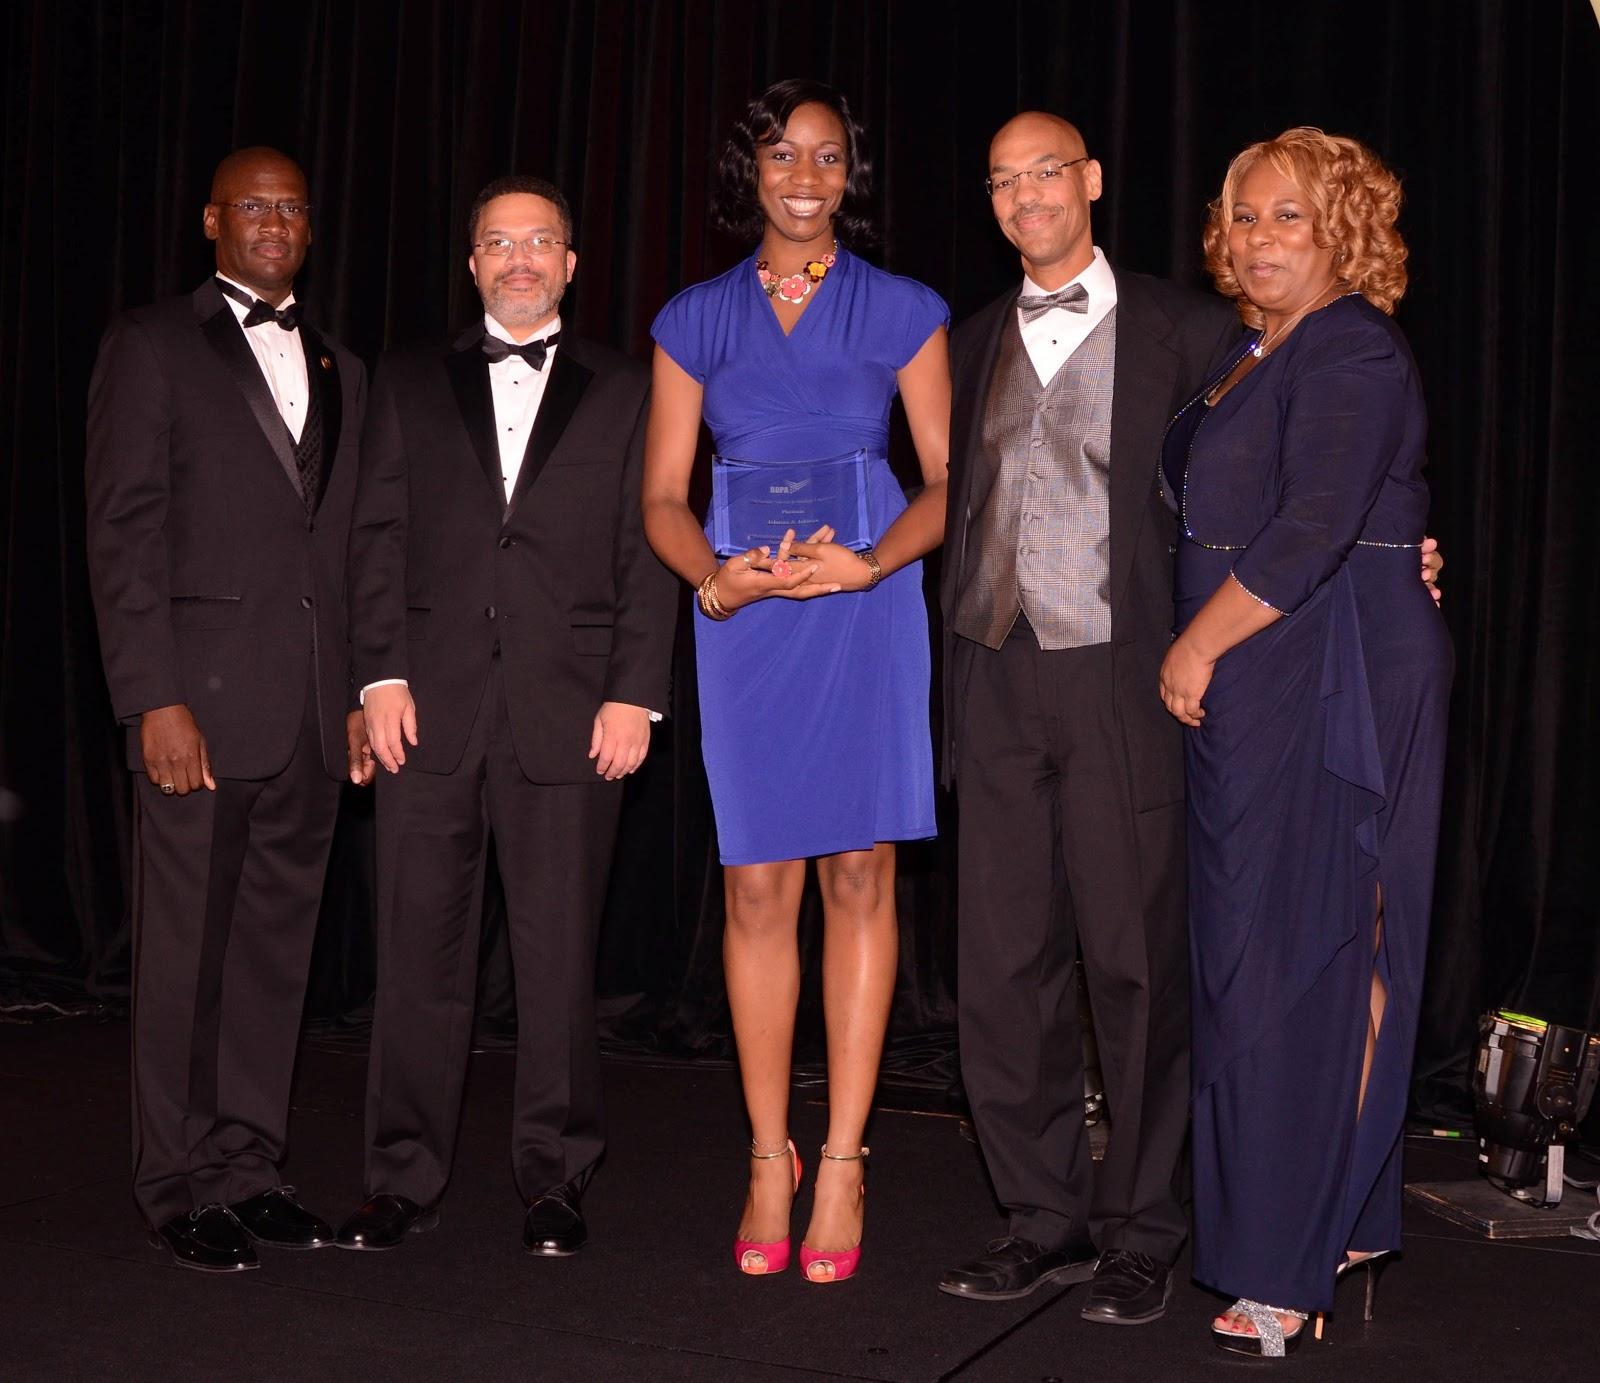 Bdpa Foundation Bdpa Awards Epsilon Awards To Individuals And Names